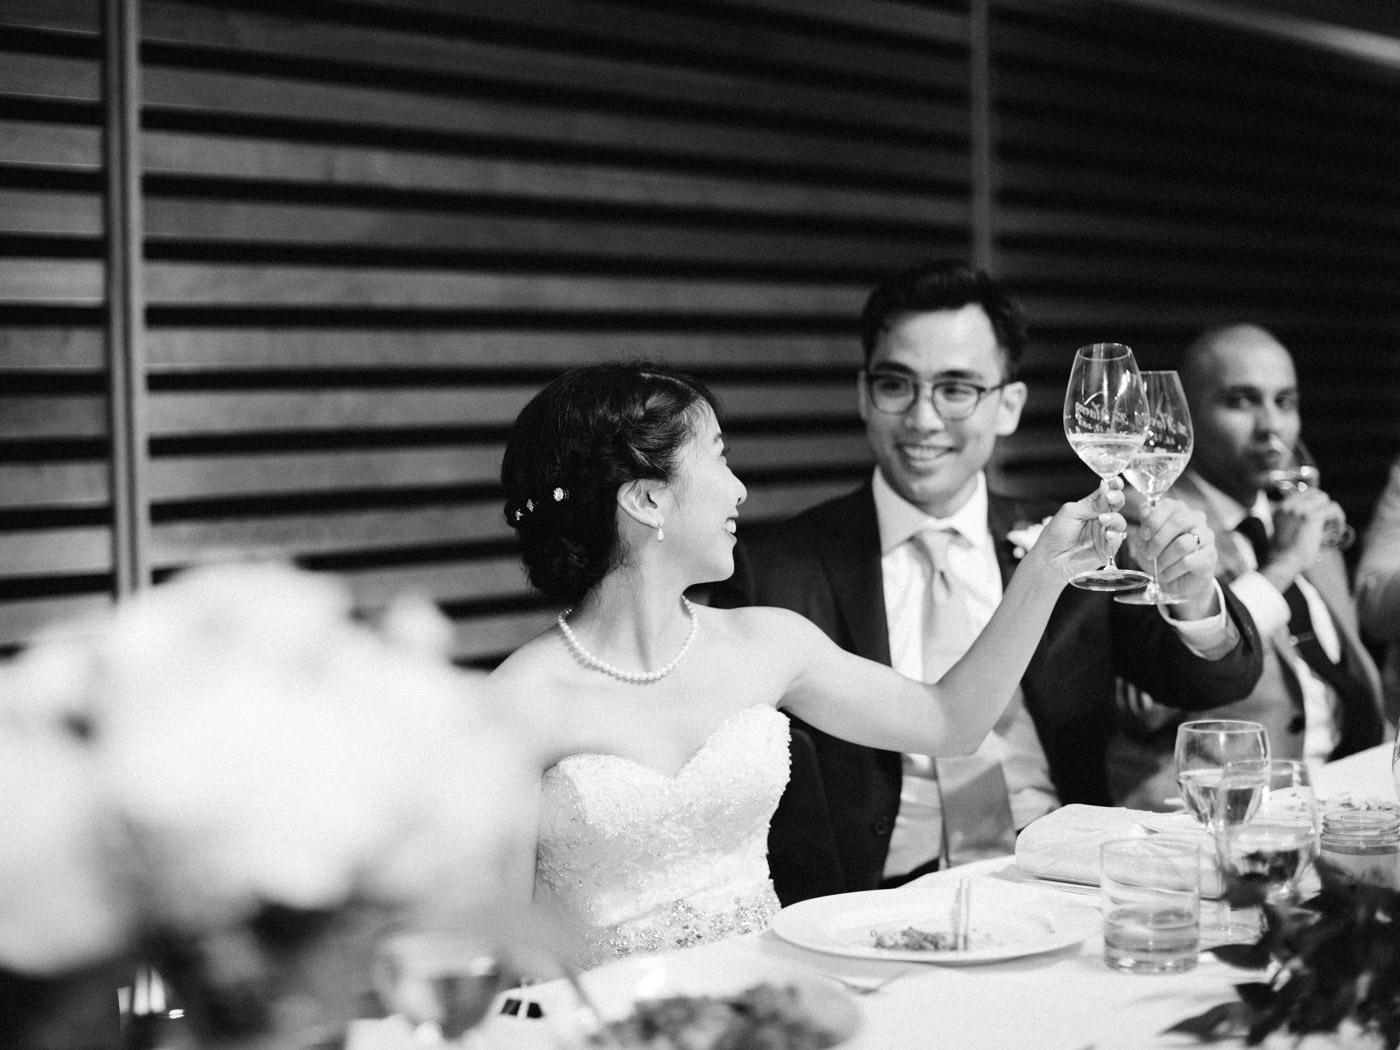 toronto_wedding_photographer_fine_art_documentary_photography-93.jpg